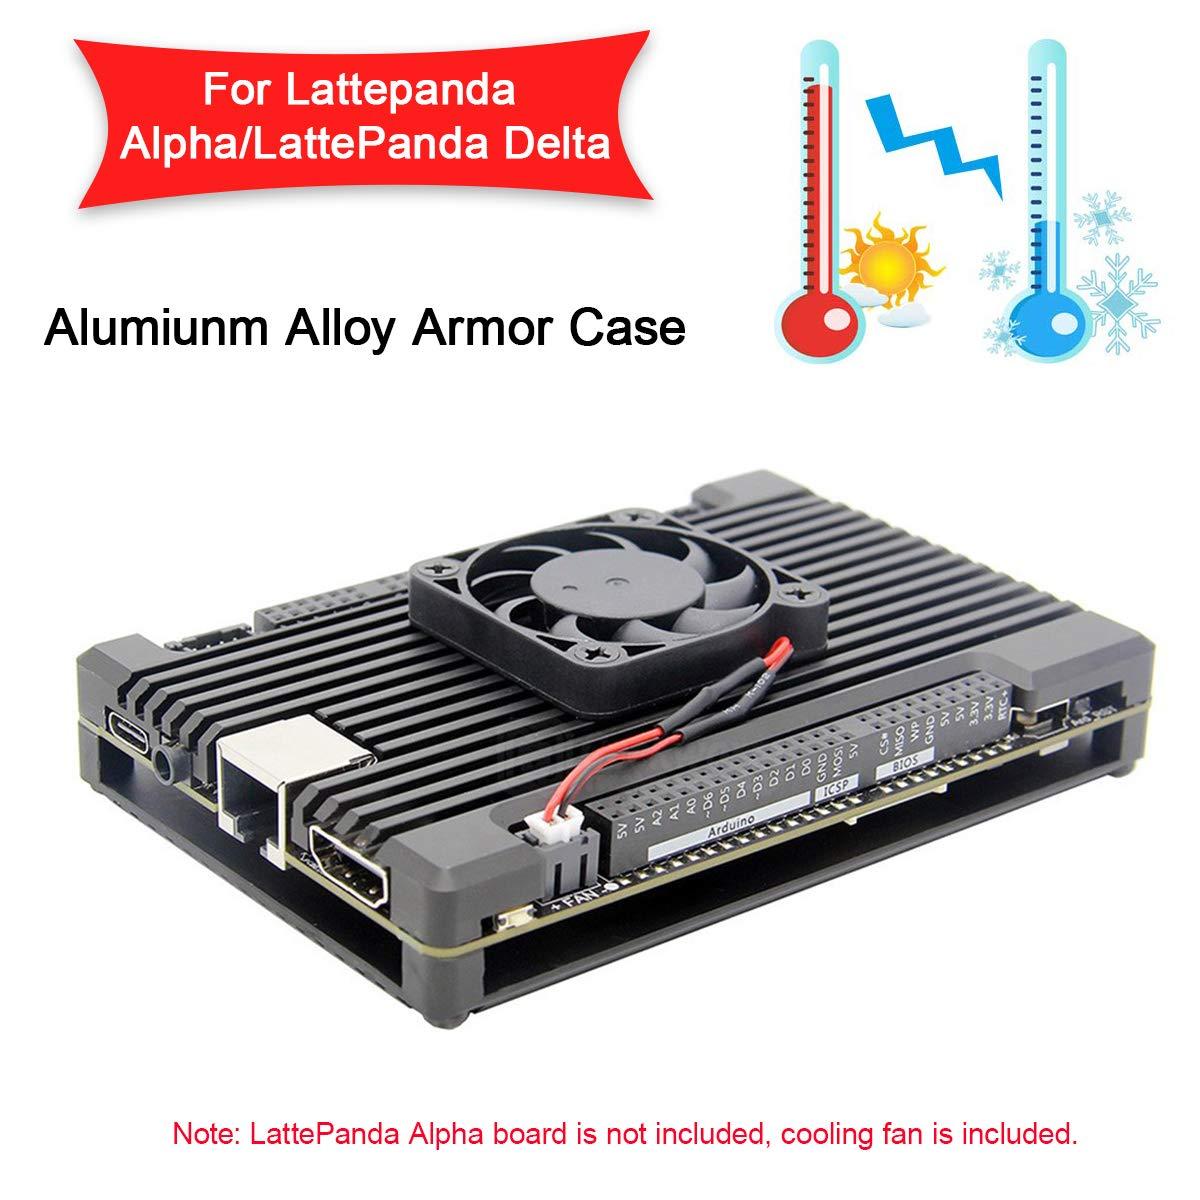 MakerFocus Aluminum Alloy Armor Case for LattePanda Alpha 864 or LattePanda Delta, Passive Cooling Enclosure with LattePanda Cooling Fan 4007